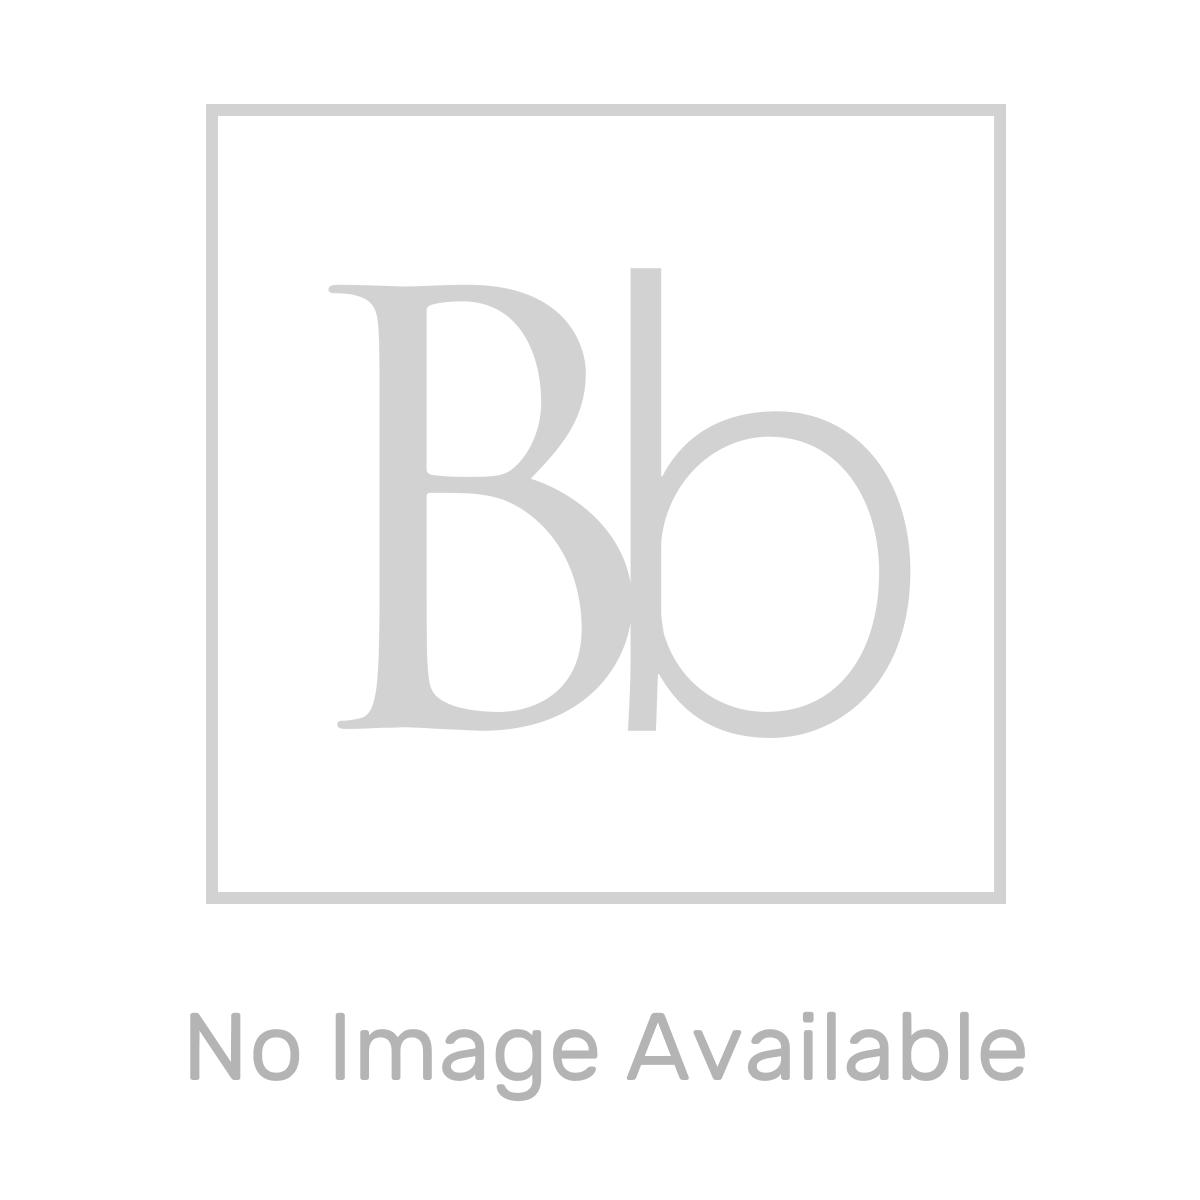 April Offset Quadrant Anti Slip Shower Tray  1000 x 800 Right Hand Line Drawing